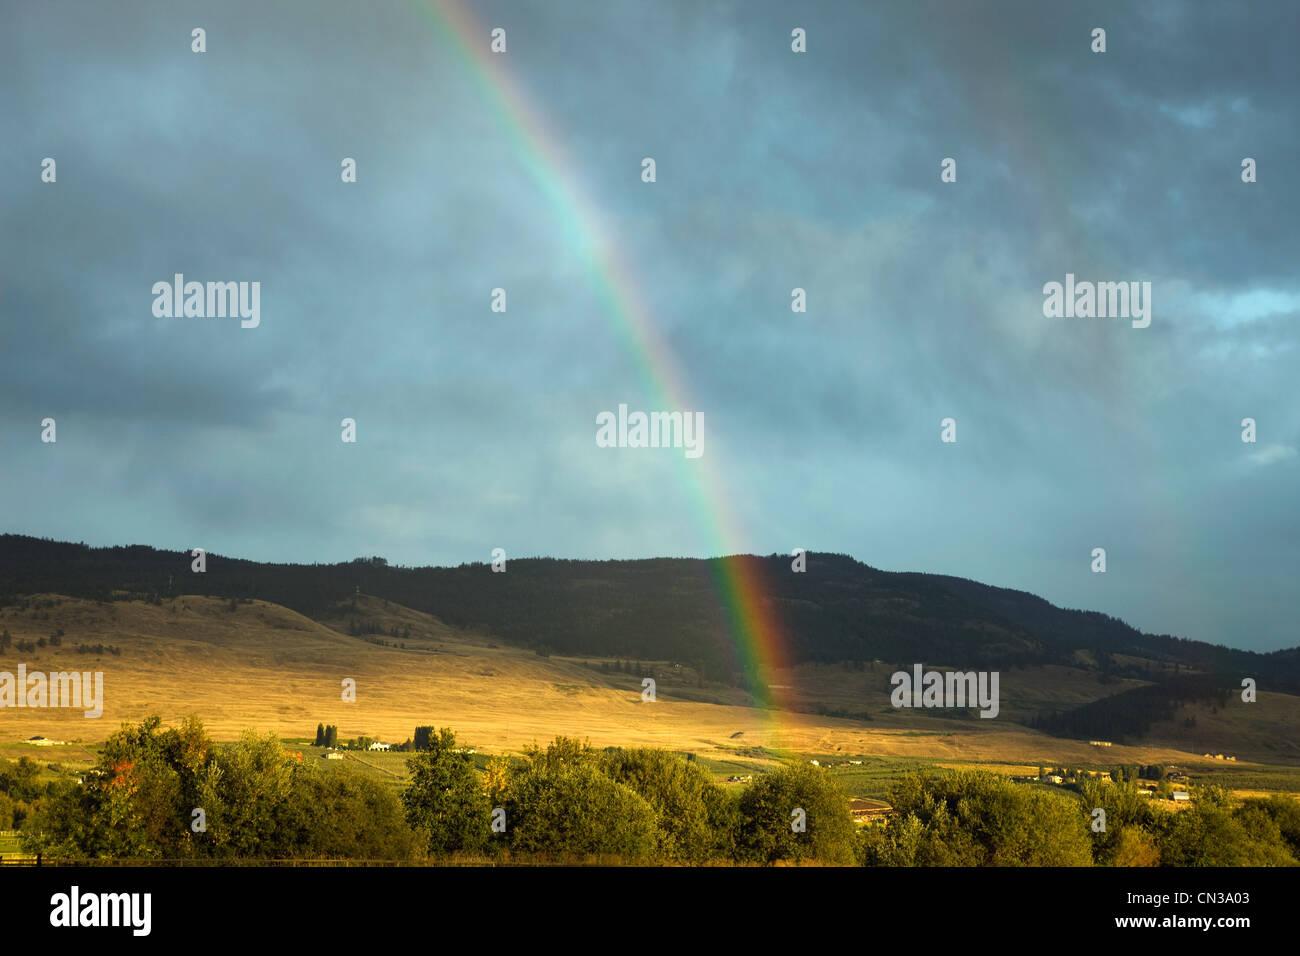 Arc-en-ciel sur le paysage pittoresque, British Columbia, Canada Photo Stock